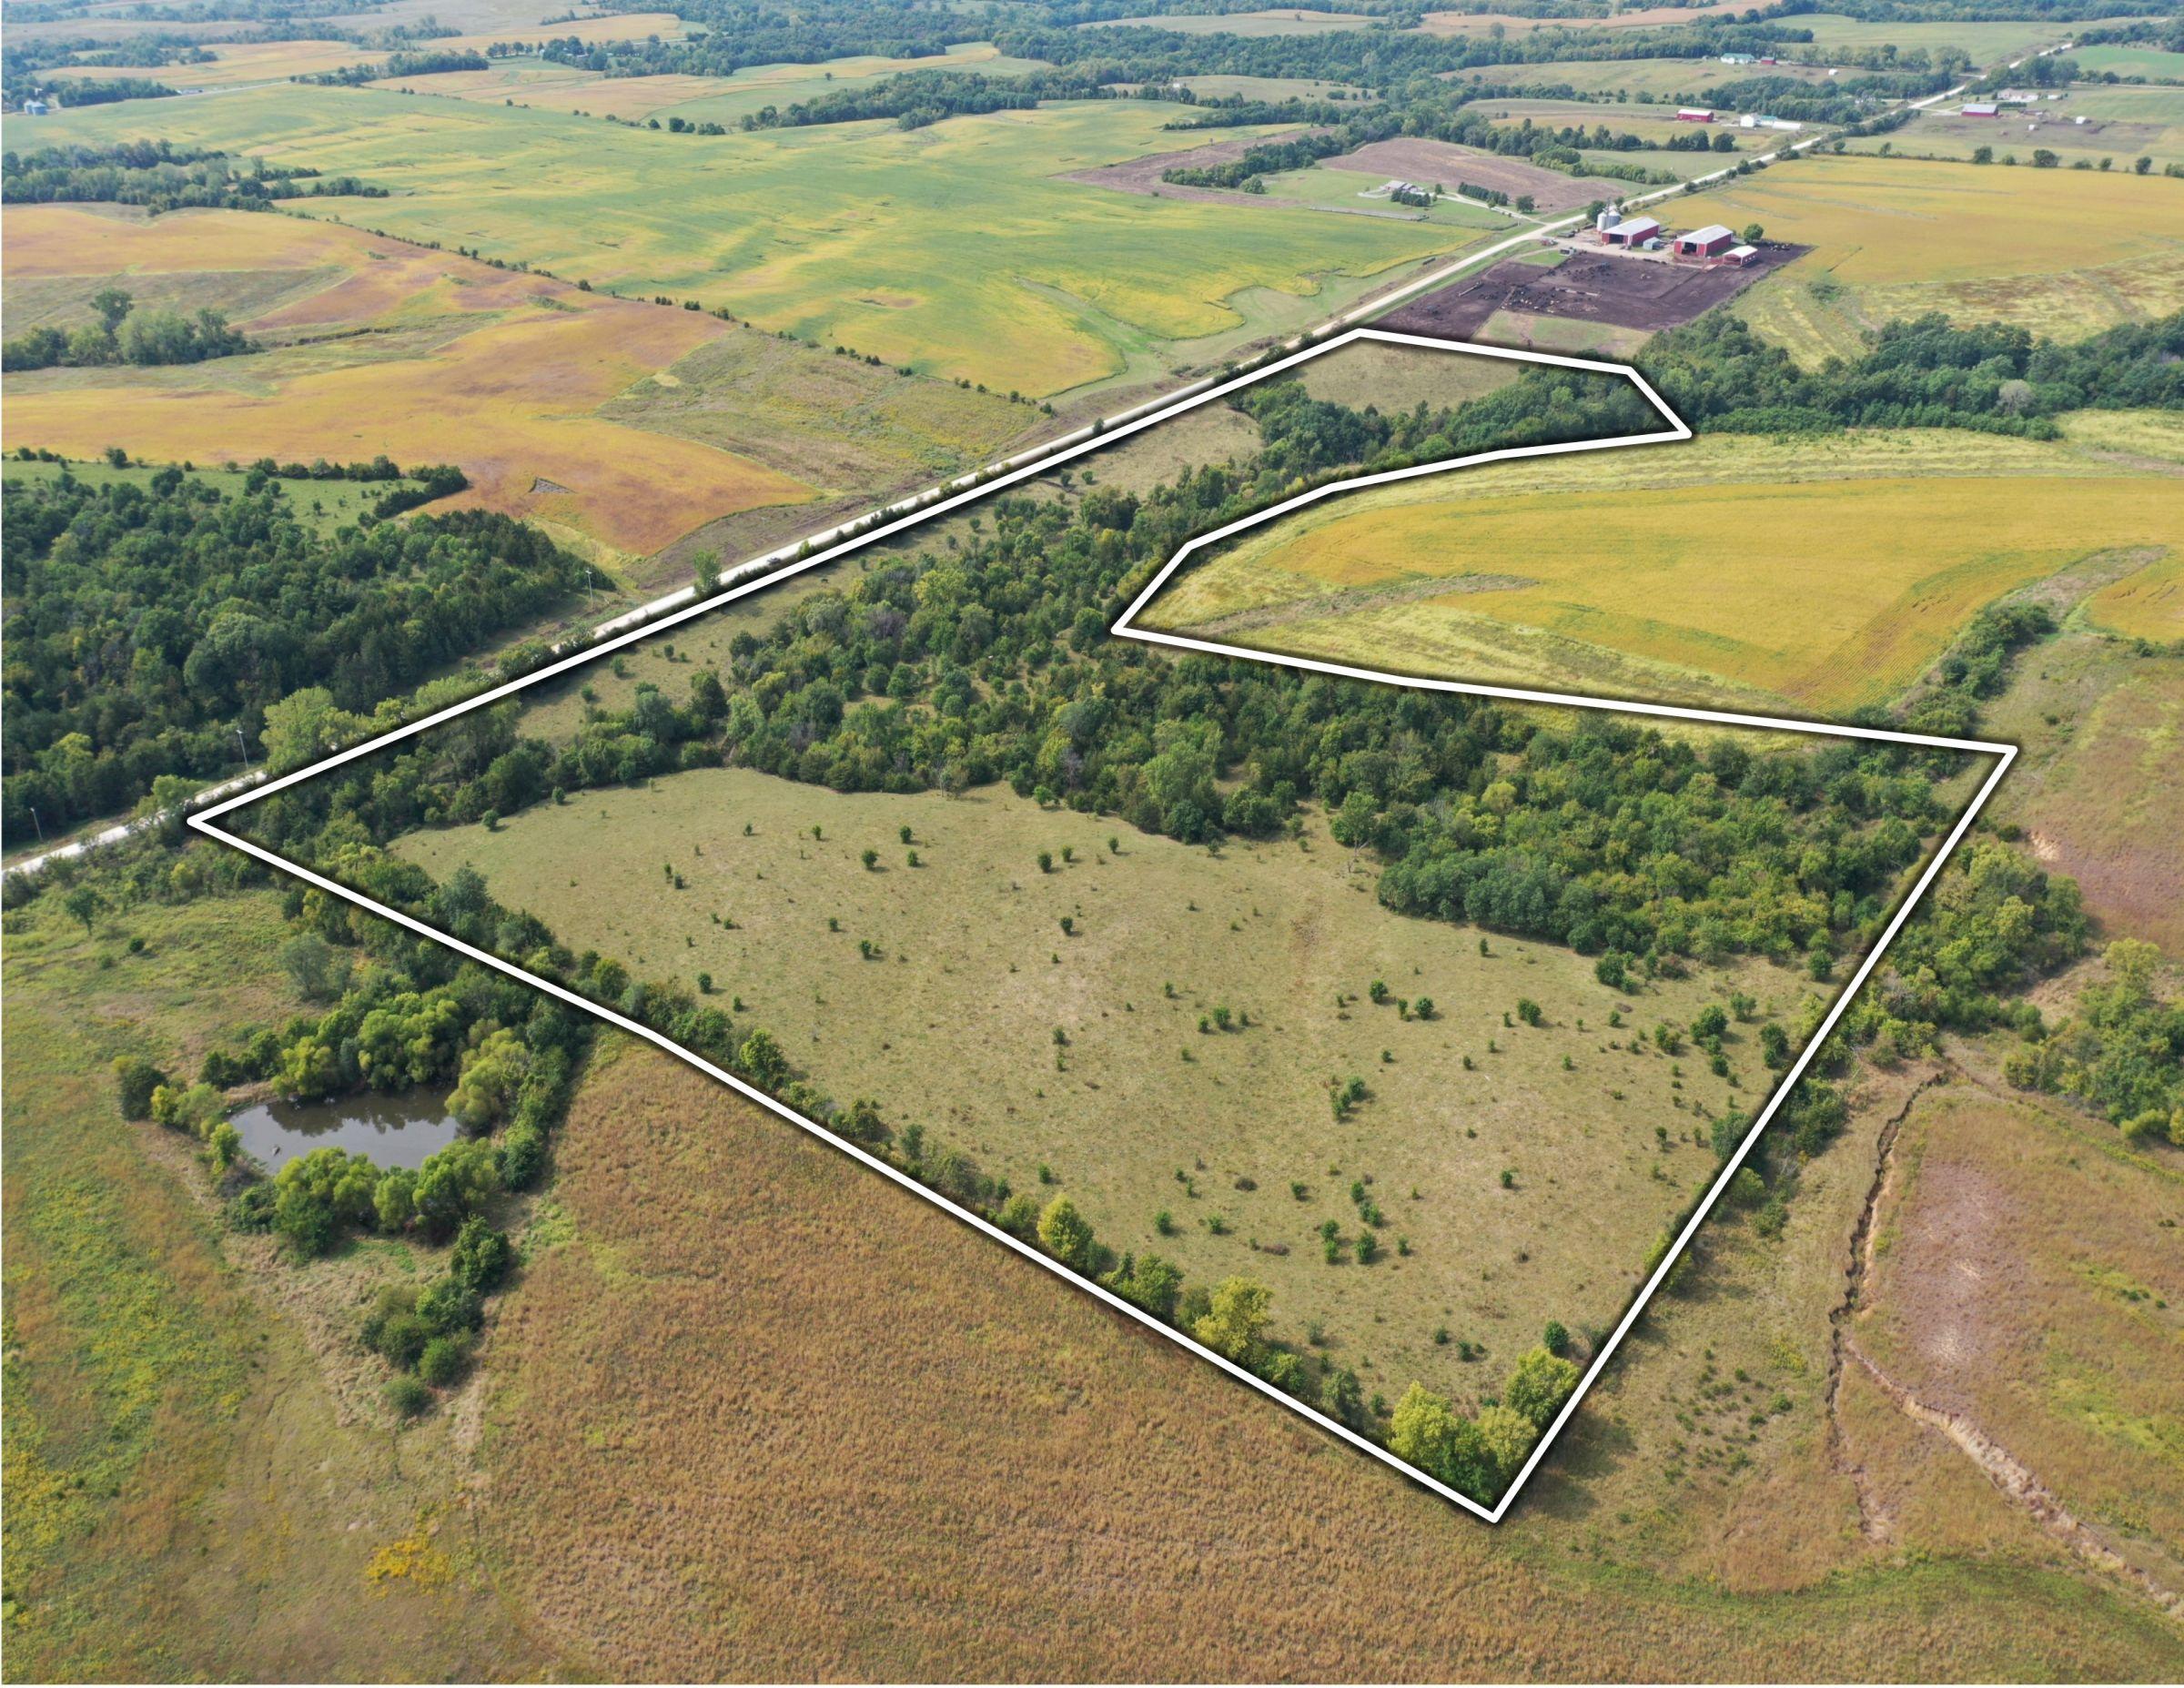 clarke-county-iowa-37-acres-listing-number-15398-1-2021-03-08-145914.jpg